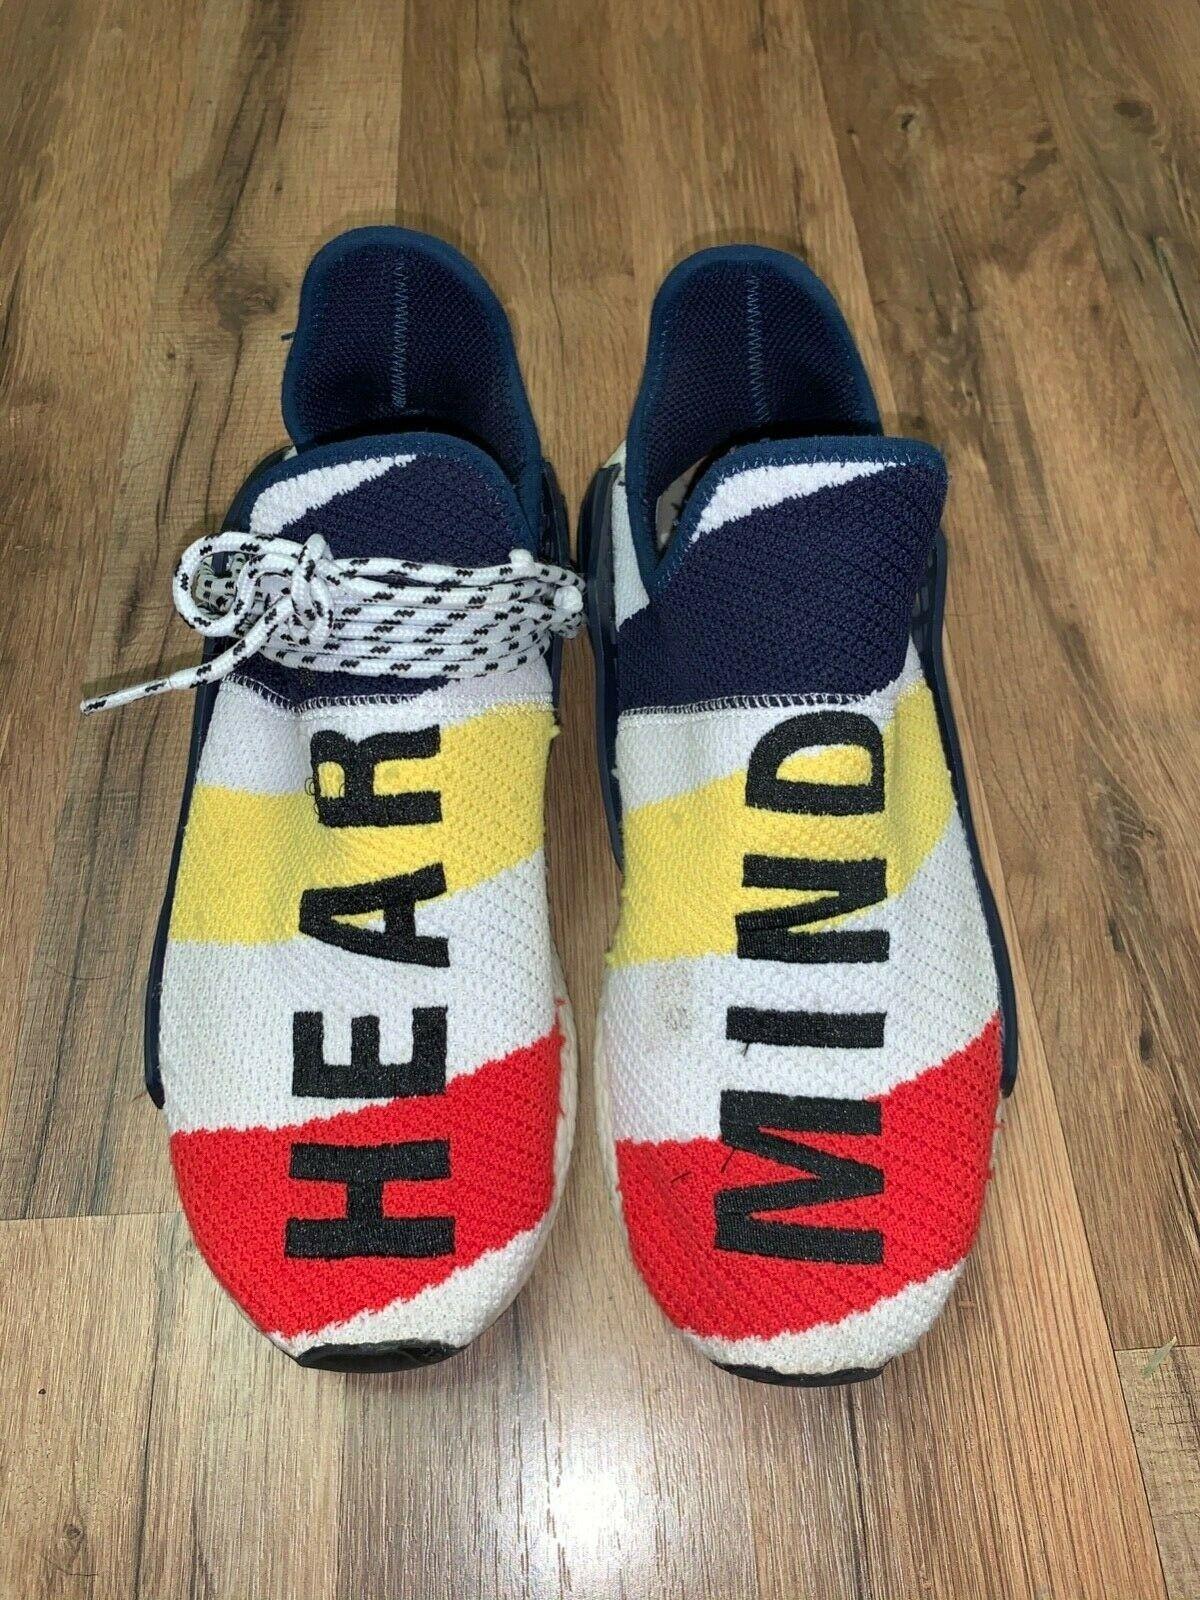 Adidas Nmd Hu Pharrell X Billionaire Boys Club Multi Color